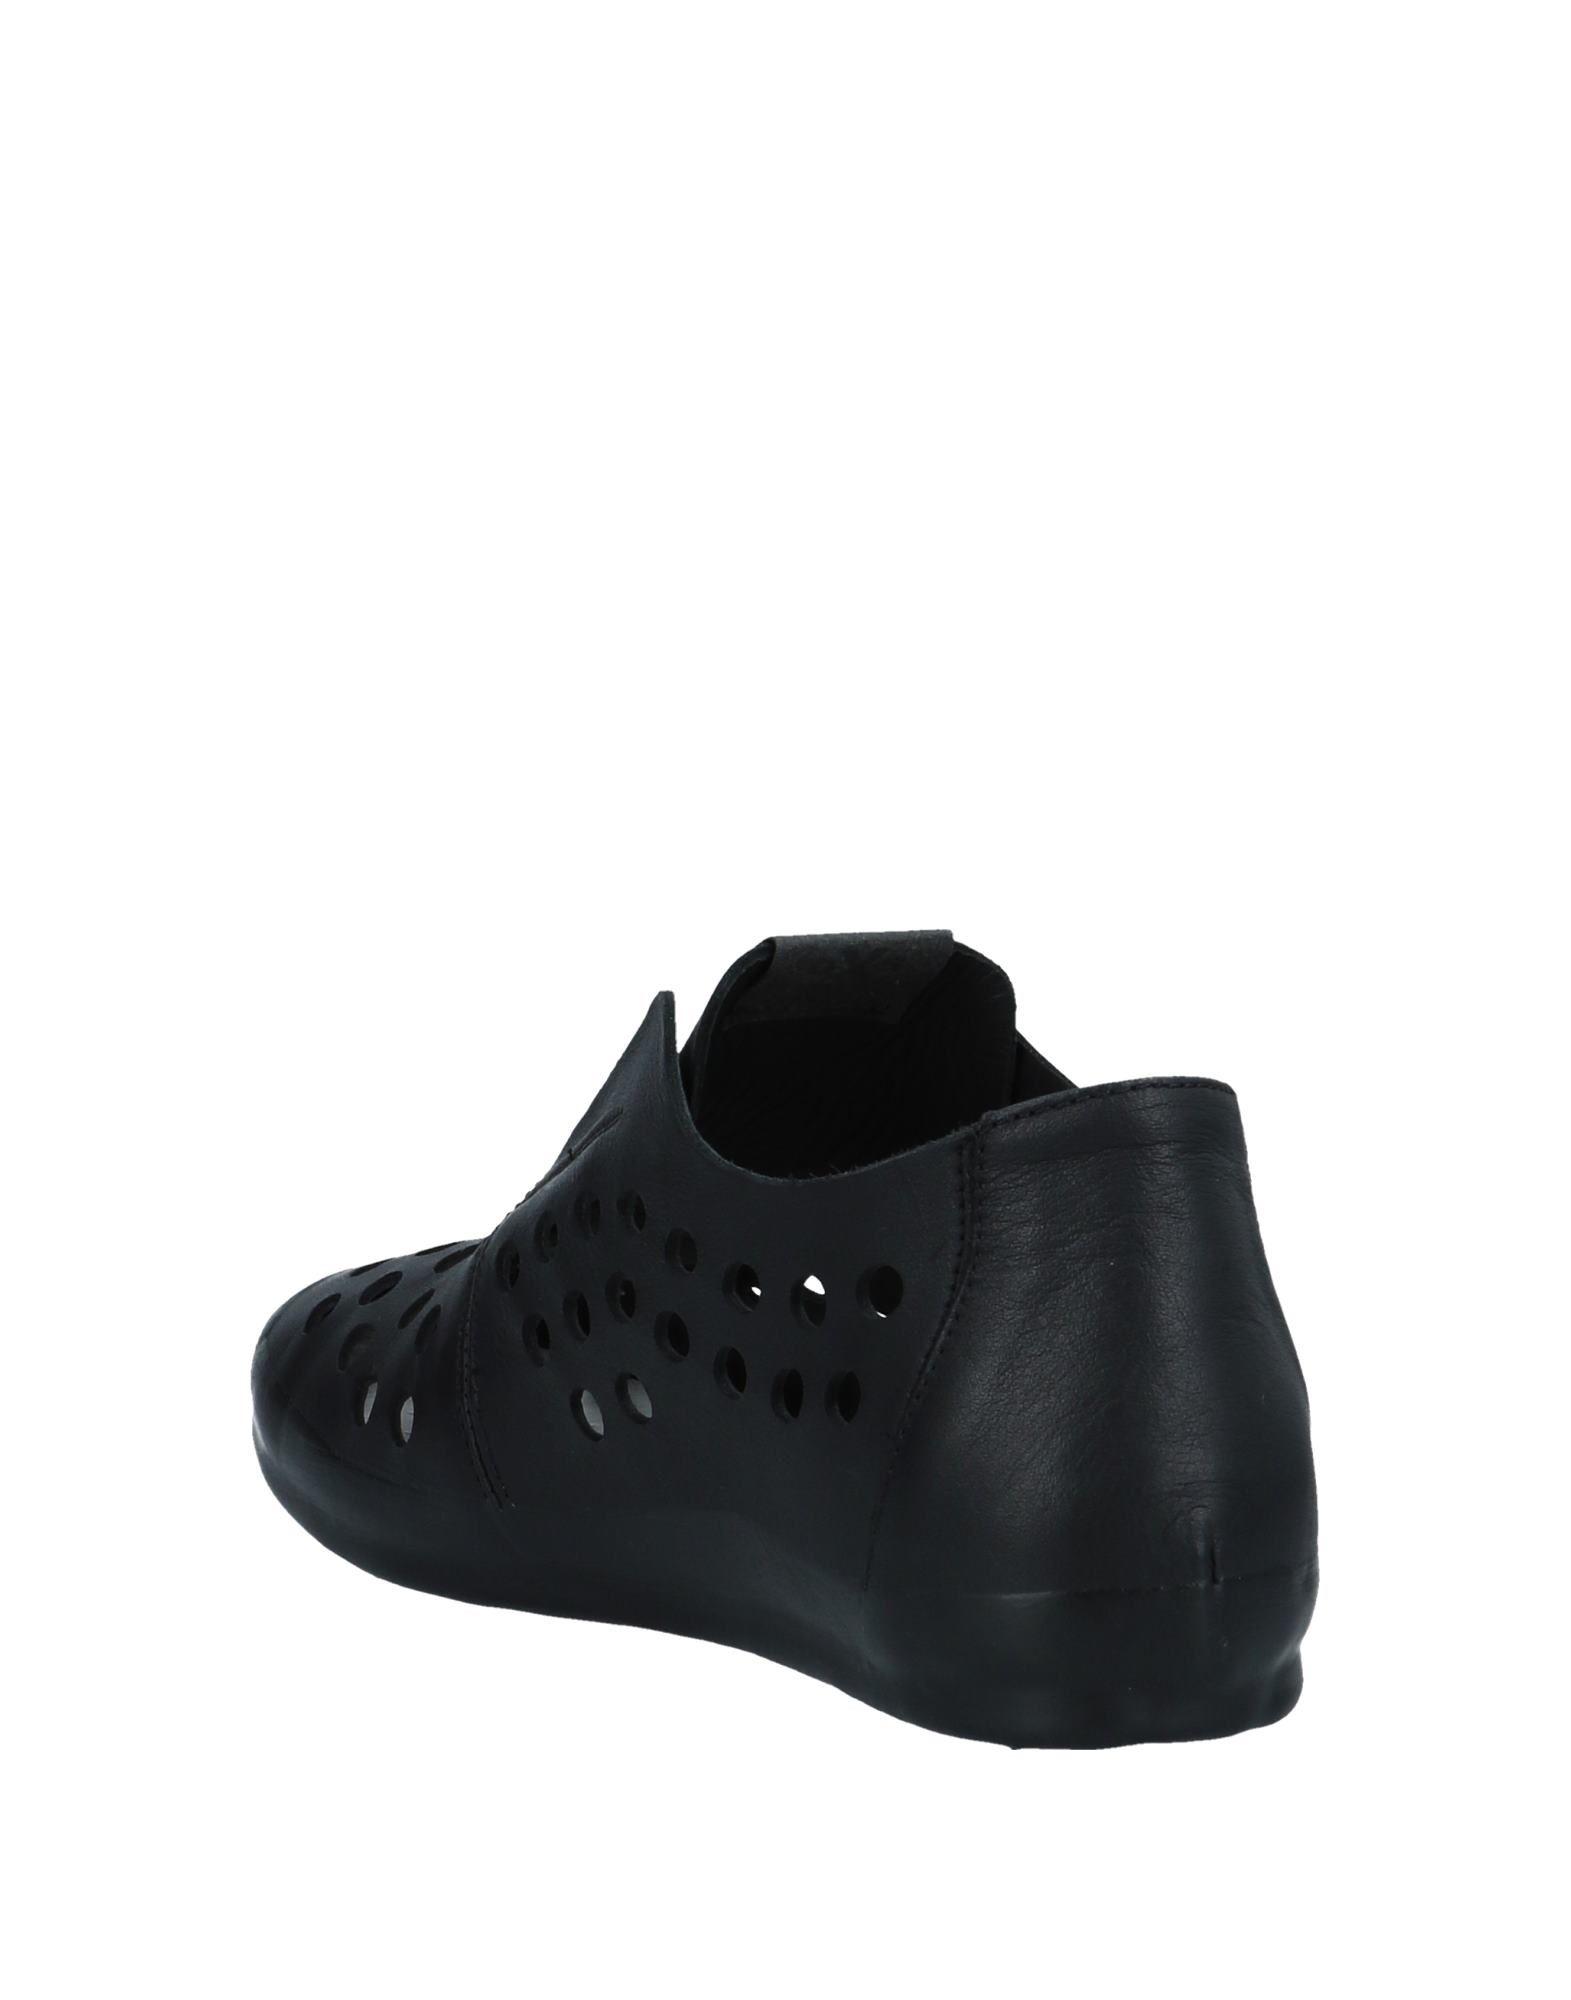 O.X.S.  Rubber Soul Sneakers Damen  O.X.S. 11144345NVGut aussehende strapazierfähige Schuhe 1e50a3